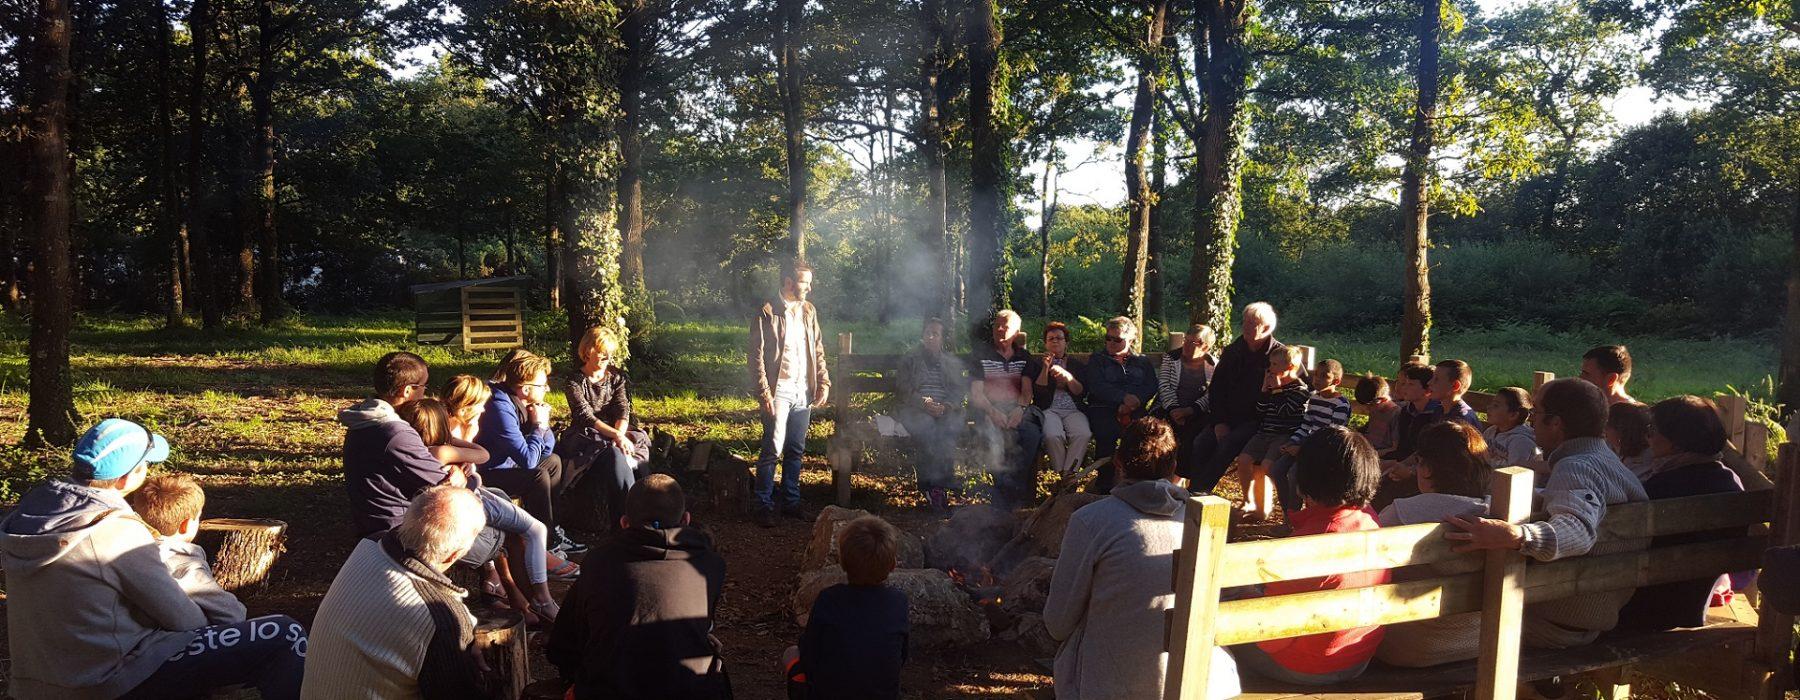 camping Pont-scorff